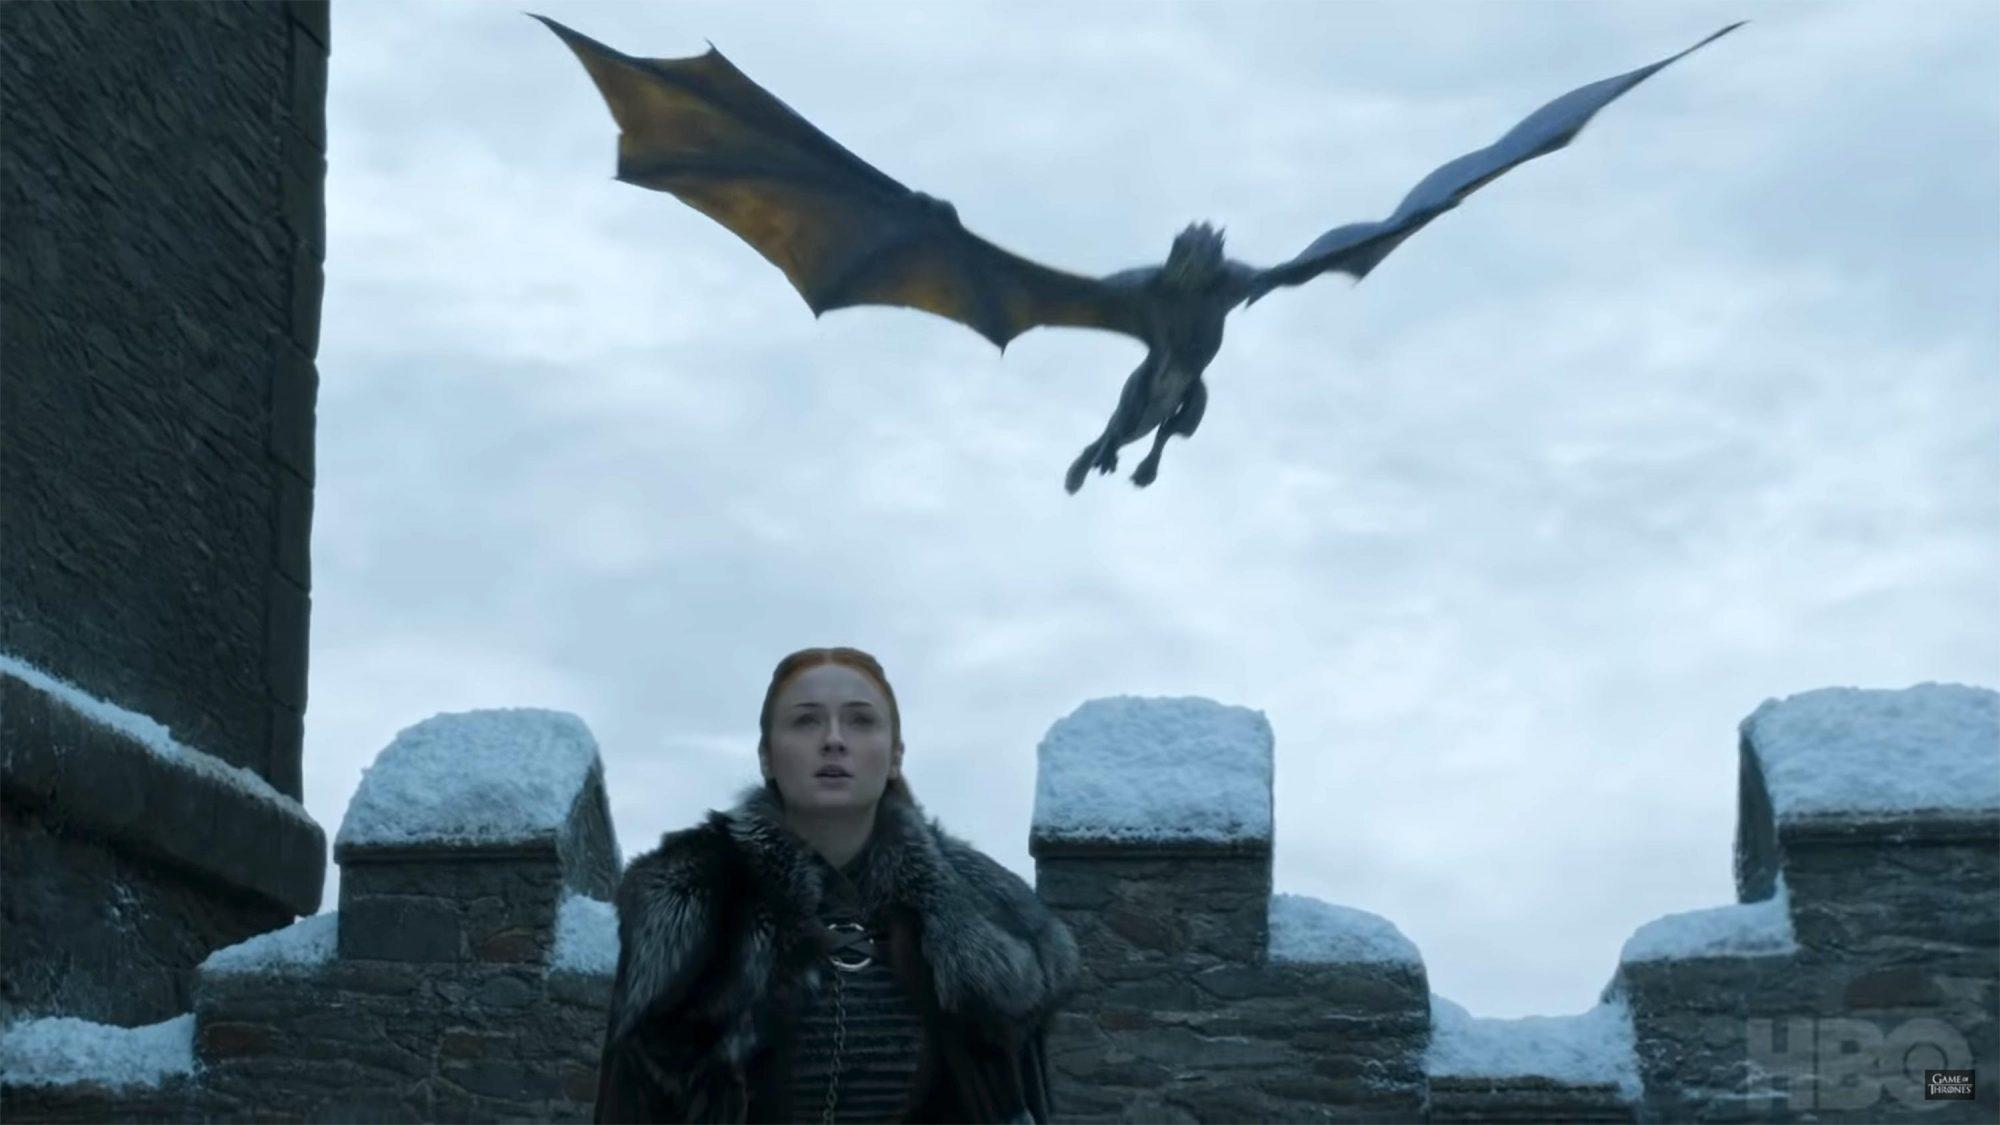 Dragons in Winterfell